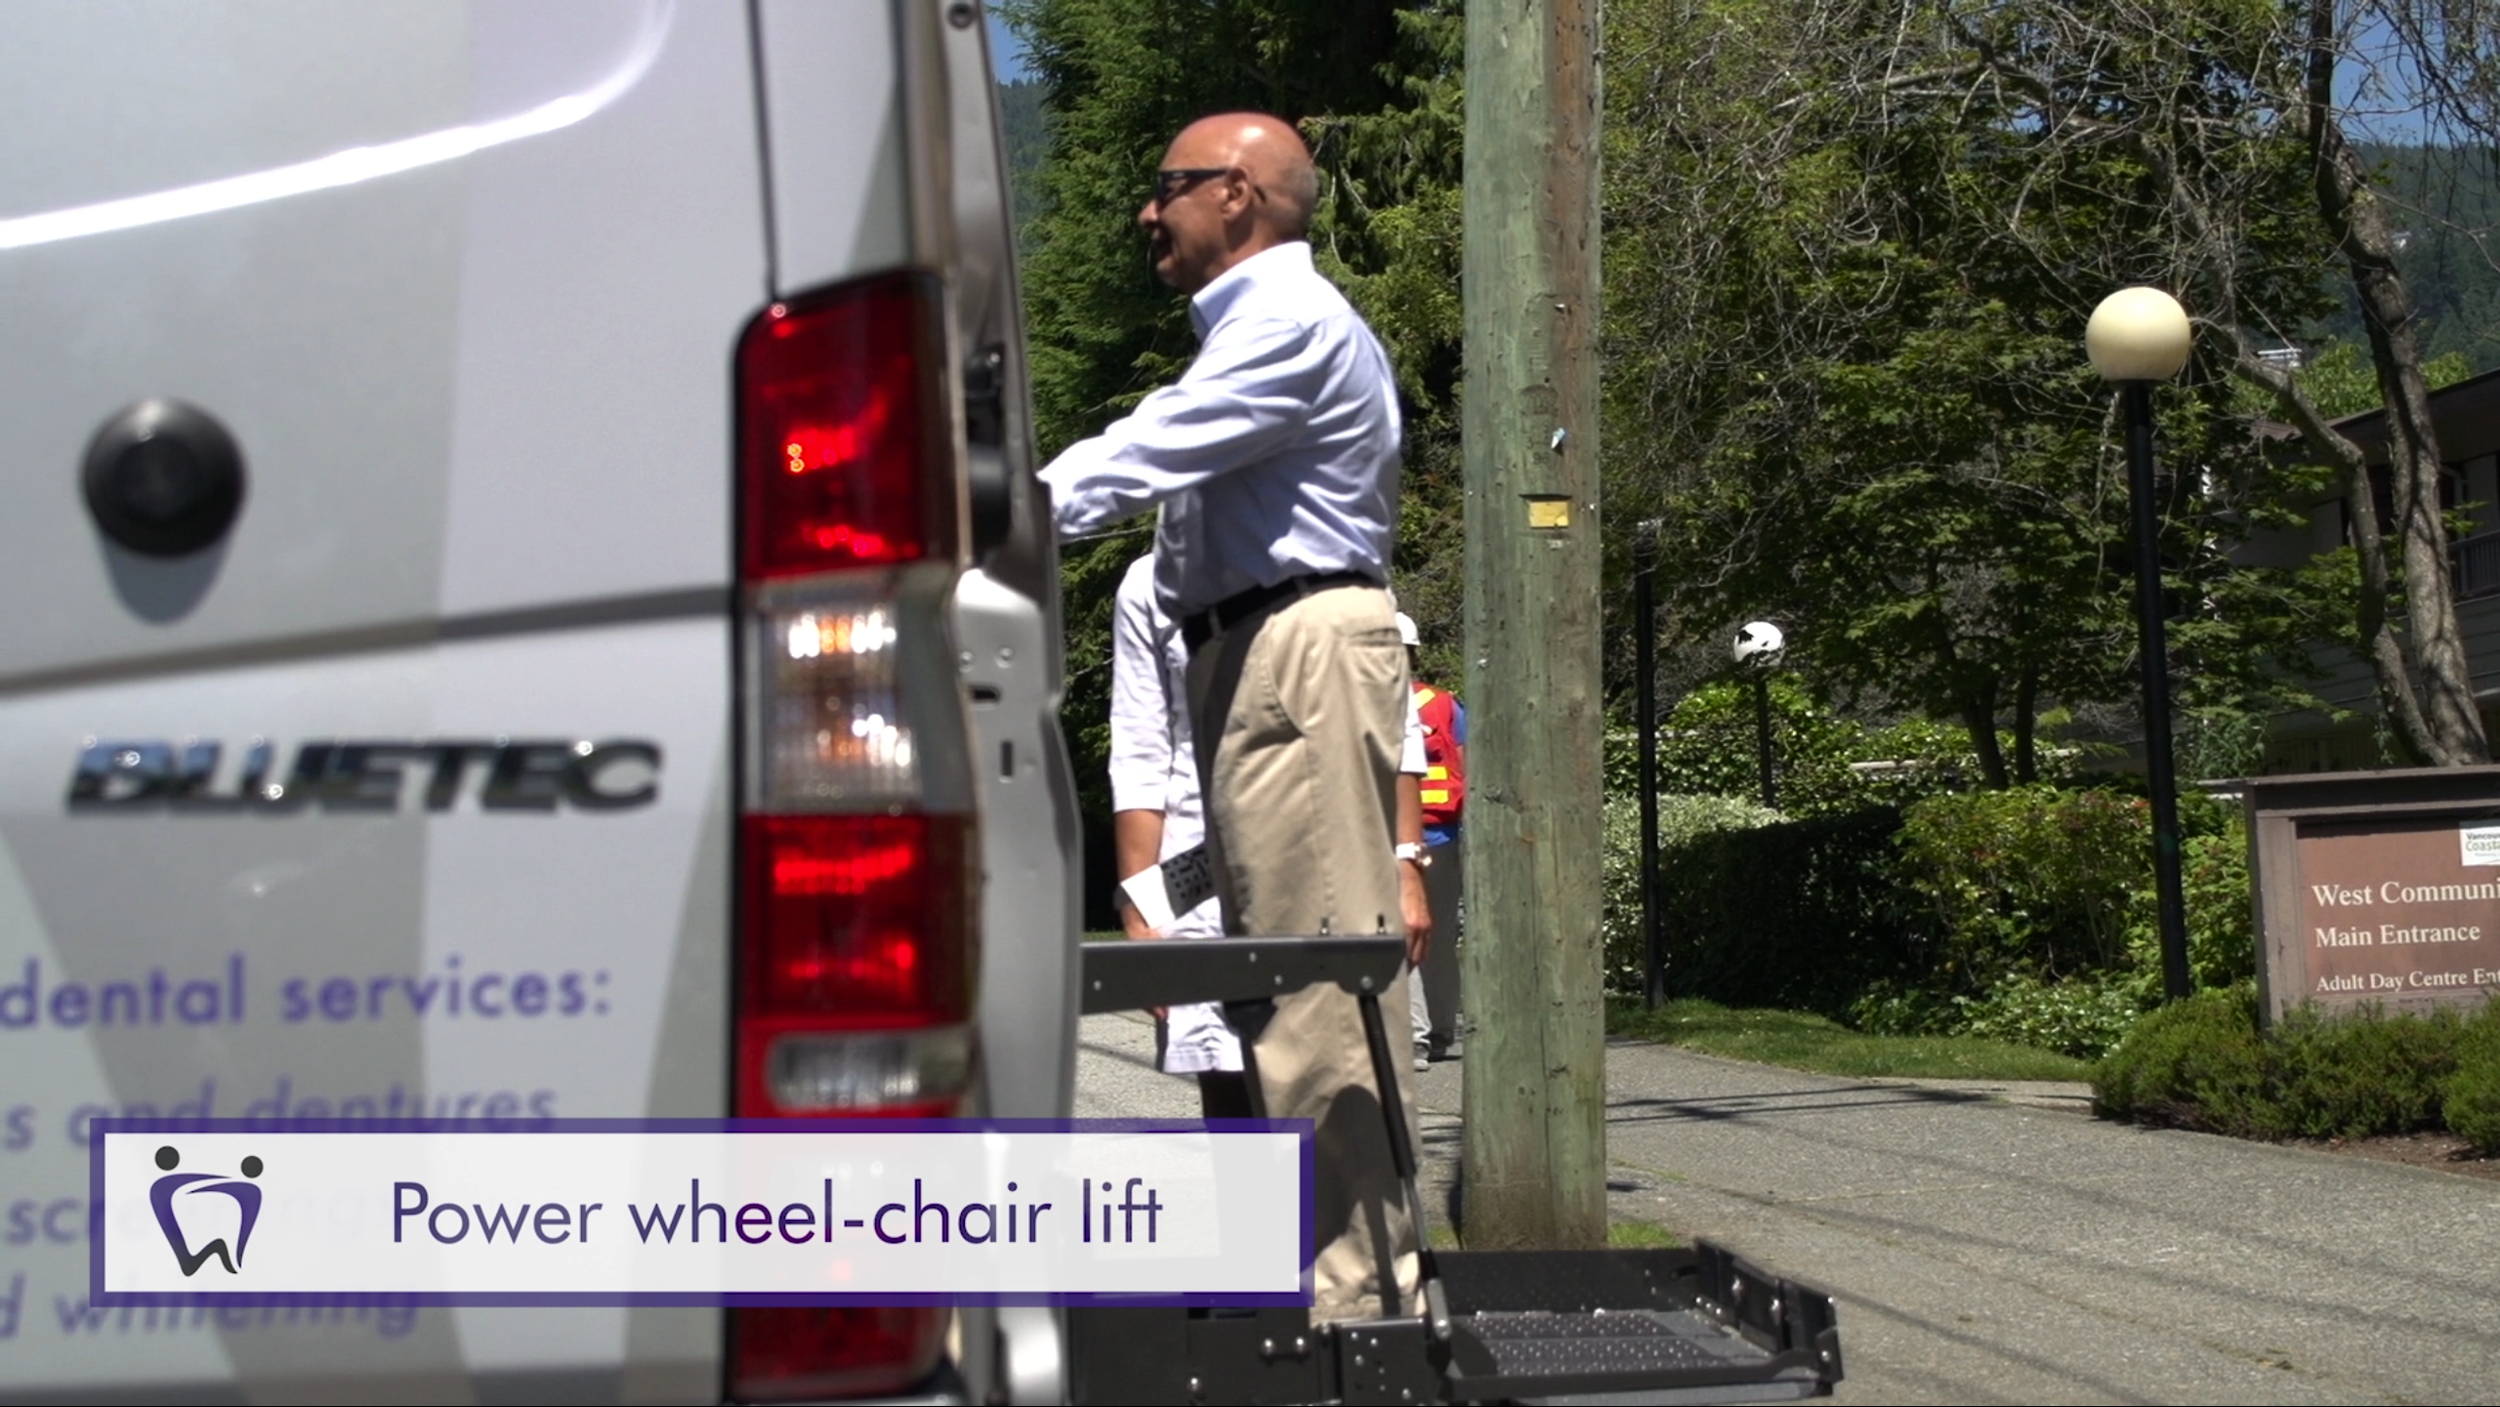 Power wheel chair lift